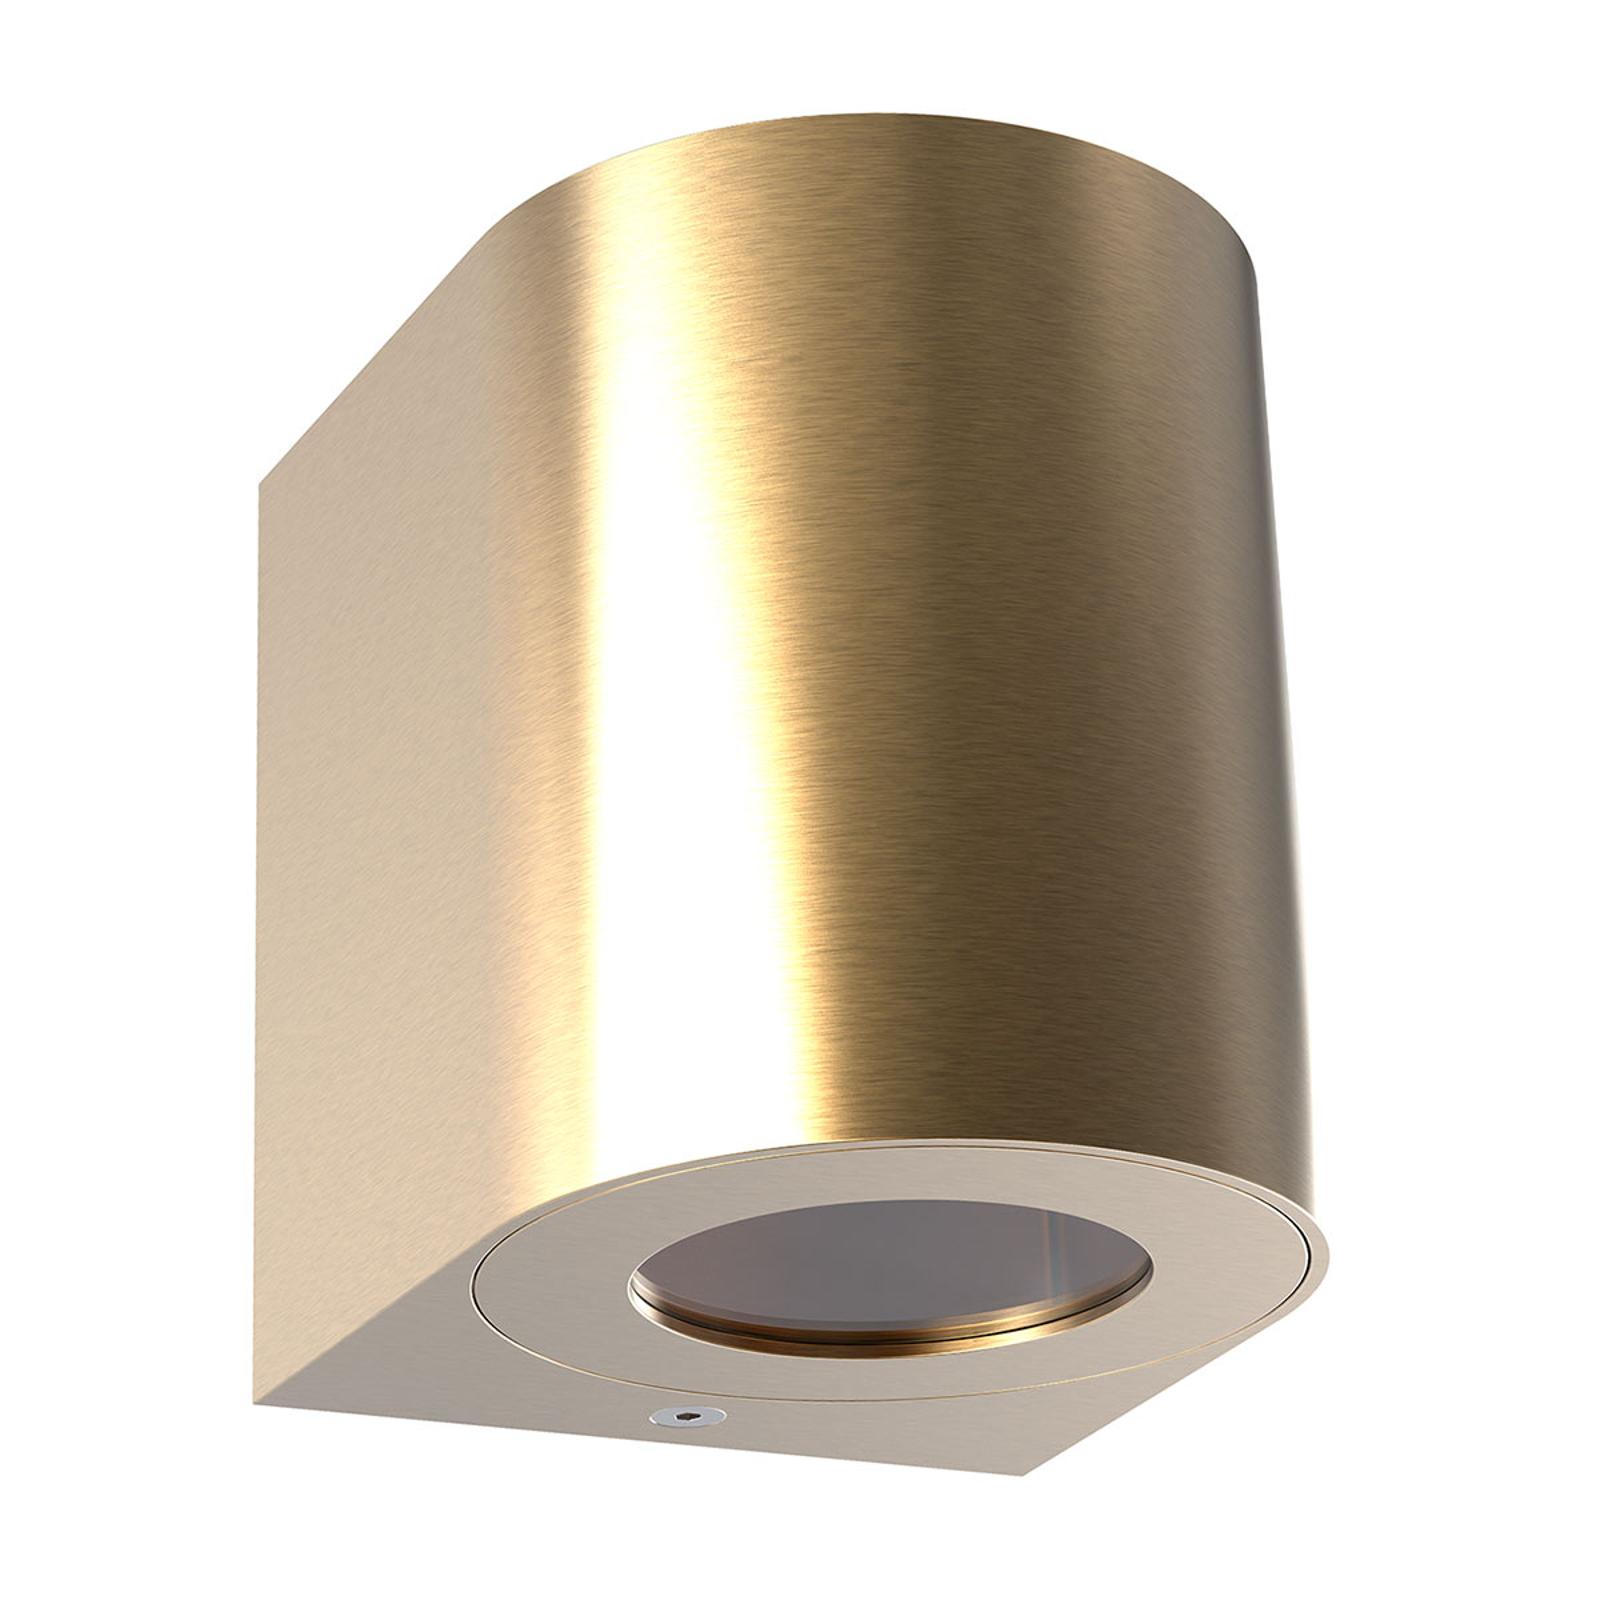 LED buitenwandlamp Canto 2, 10 cm, messing